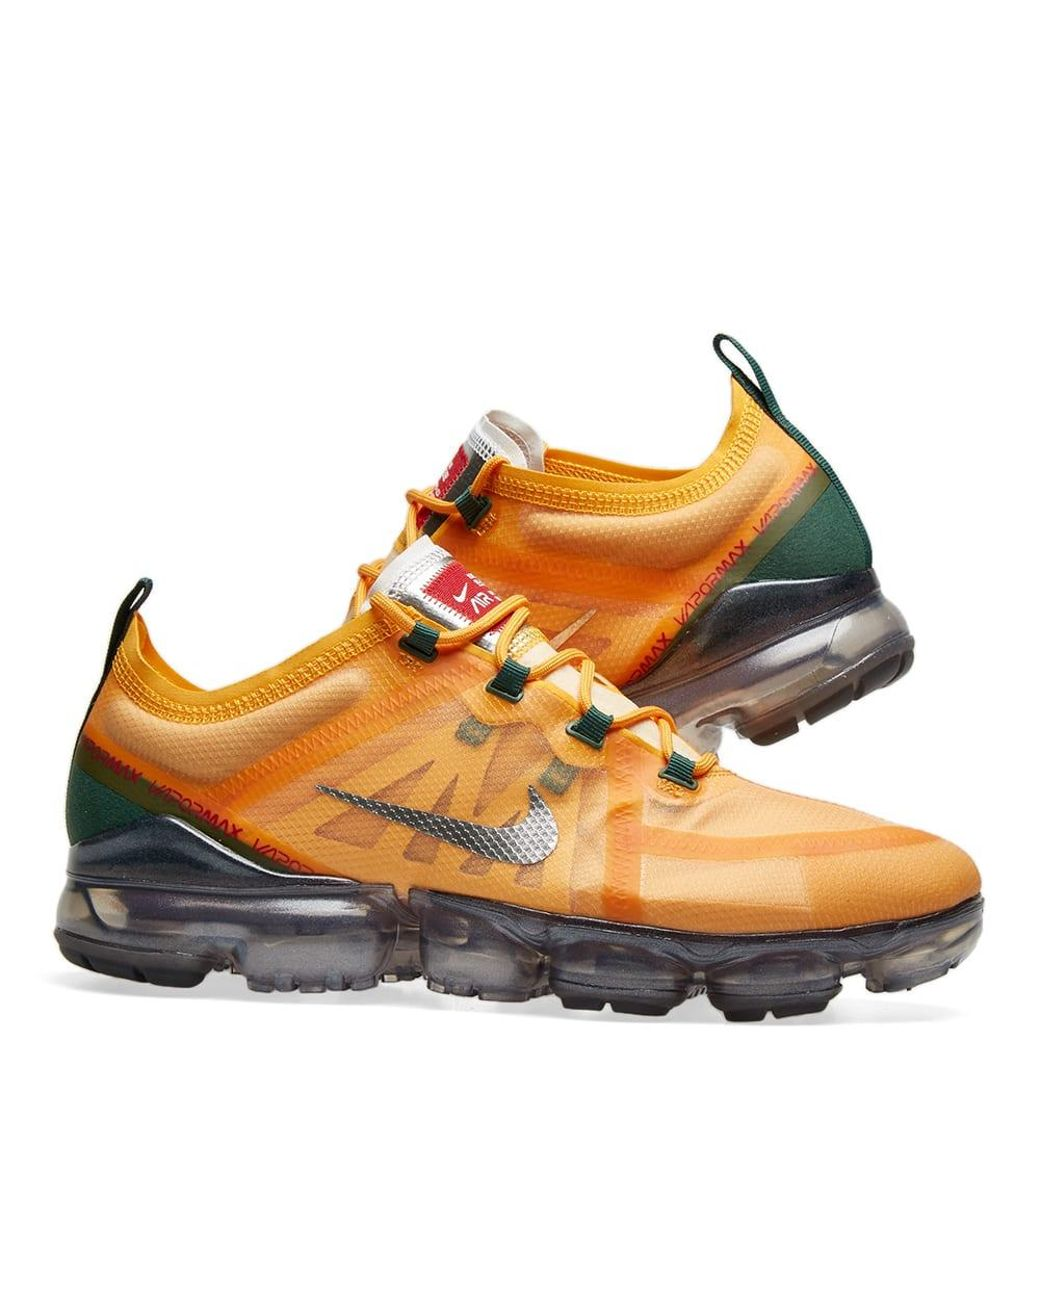 Nike Orange Air Vapormax 2019 for men